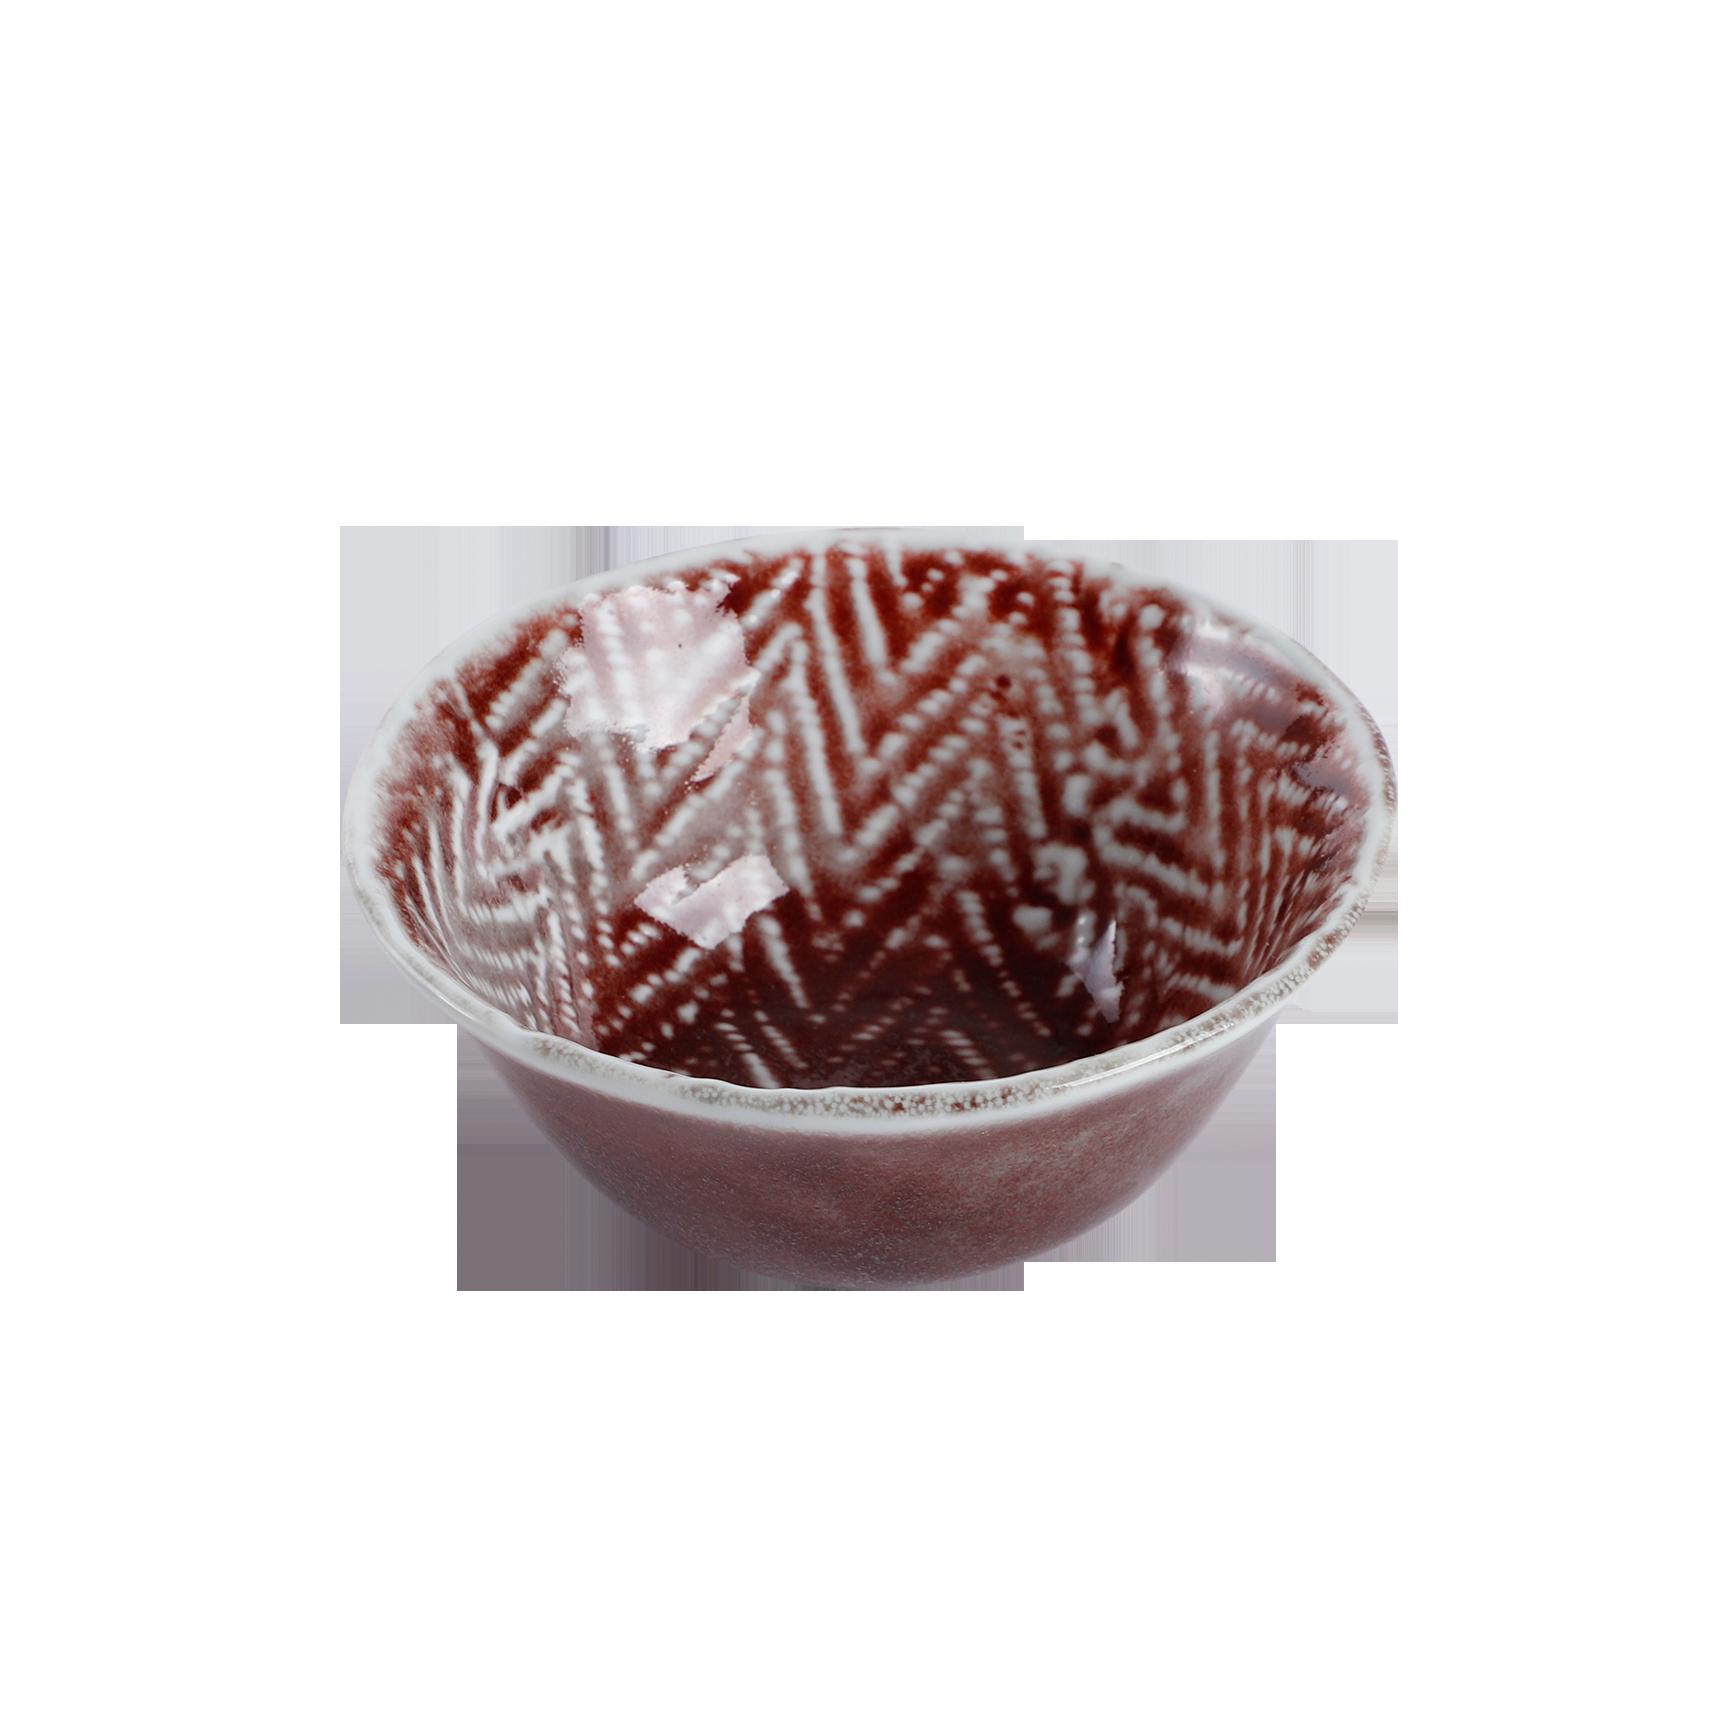 Mid-printed bowl